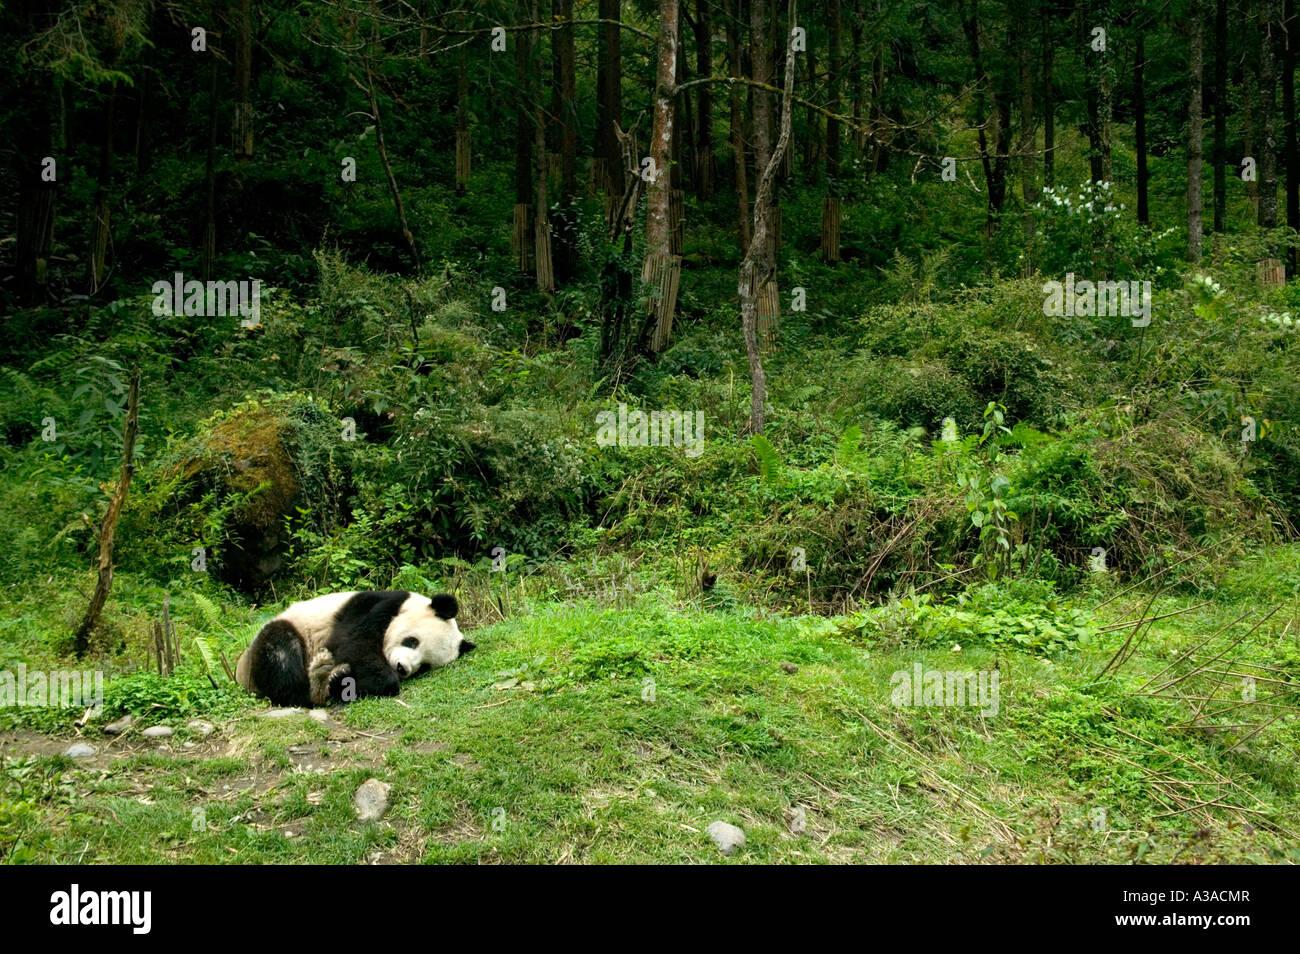 wwf panda forest - photo #5